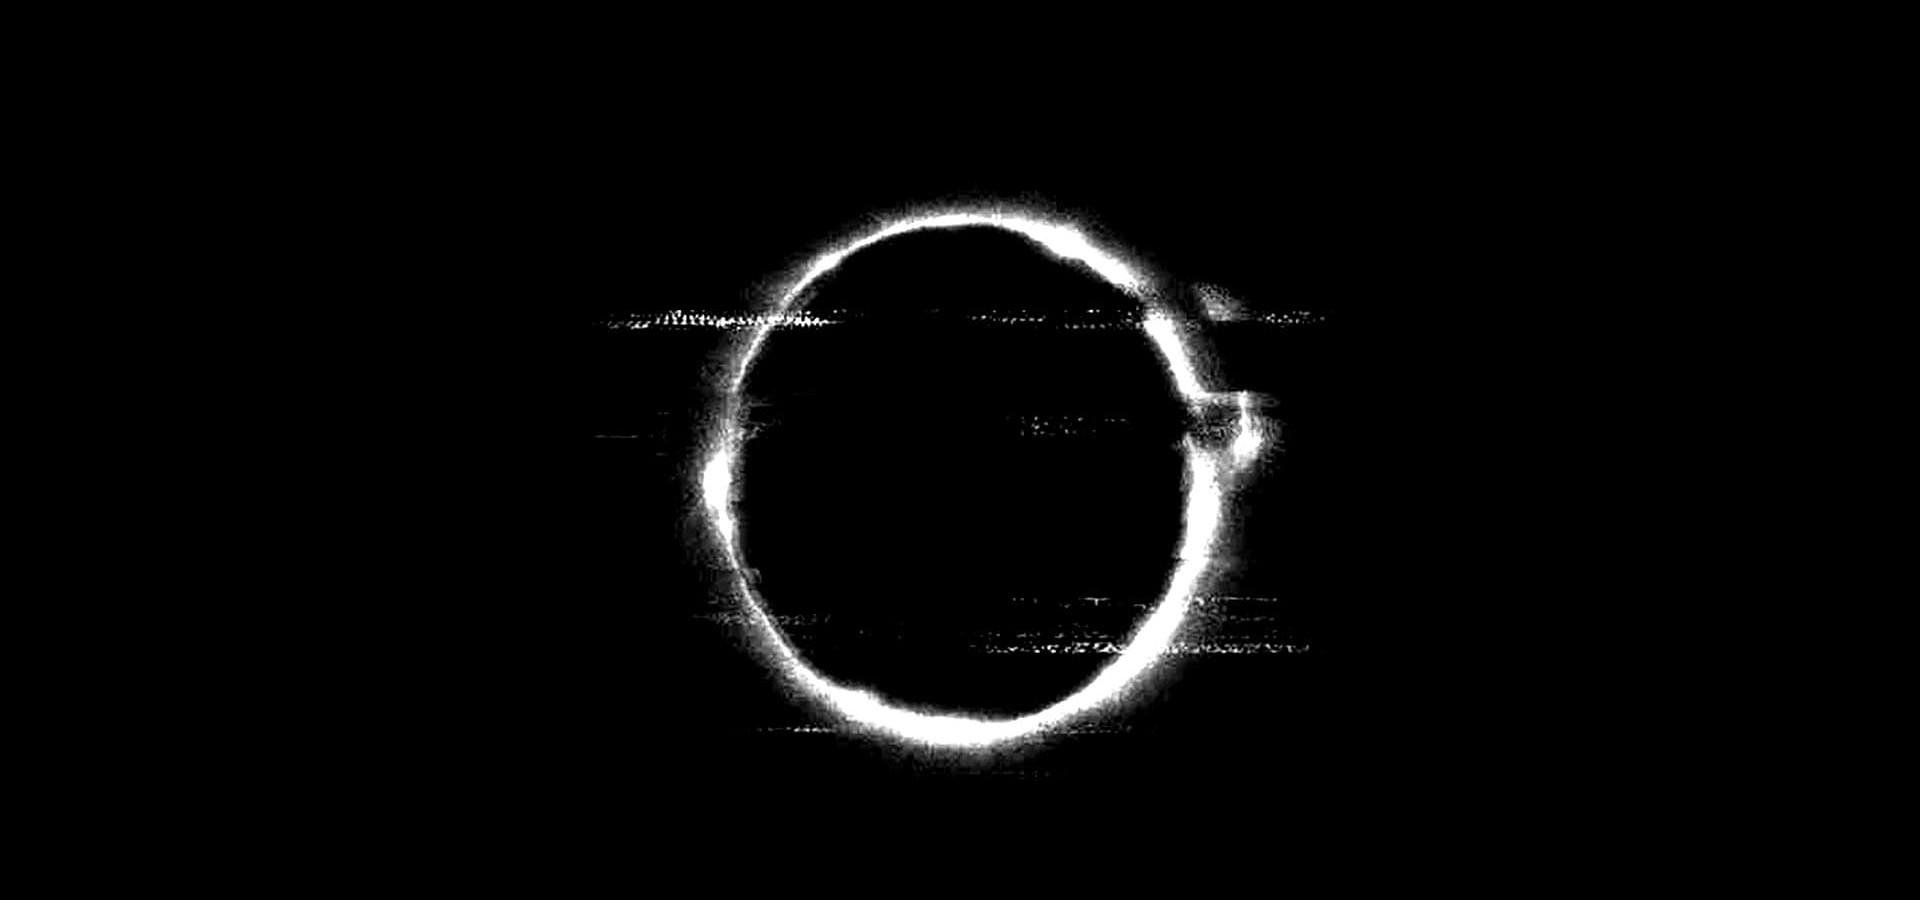 The Ring (La señal)